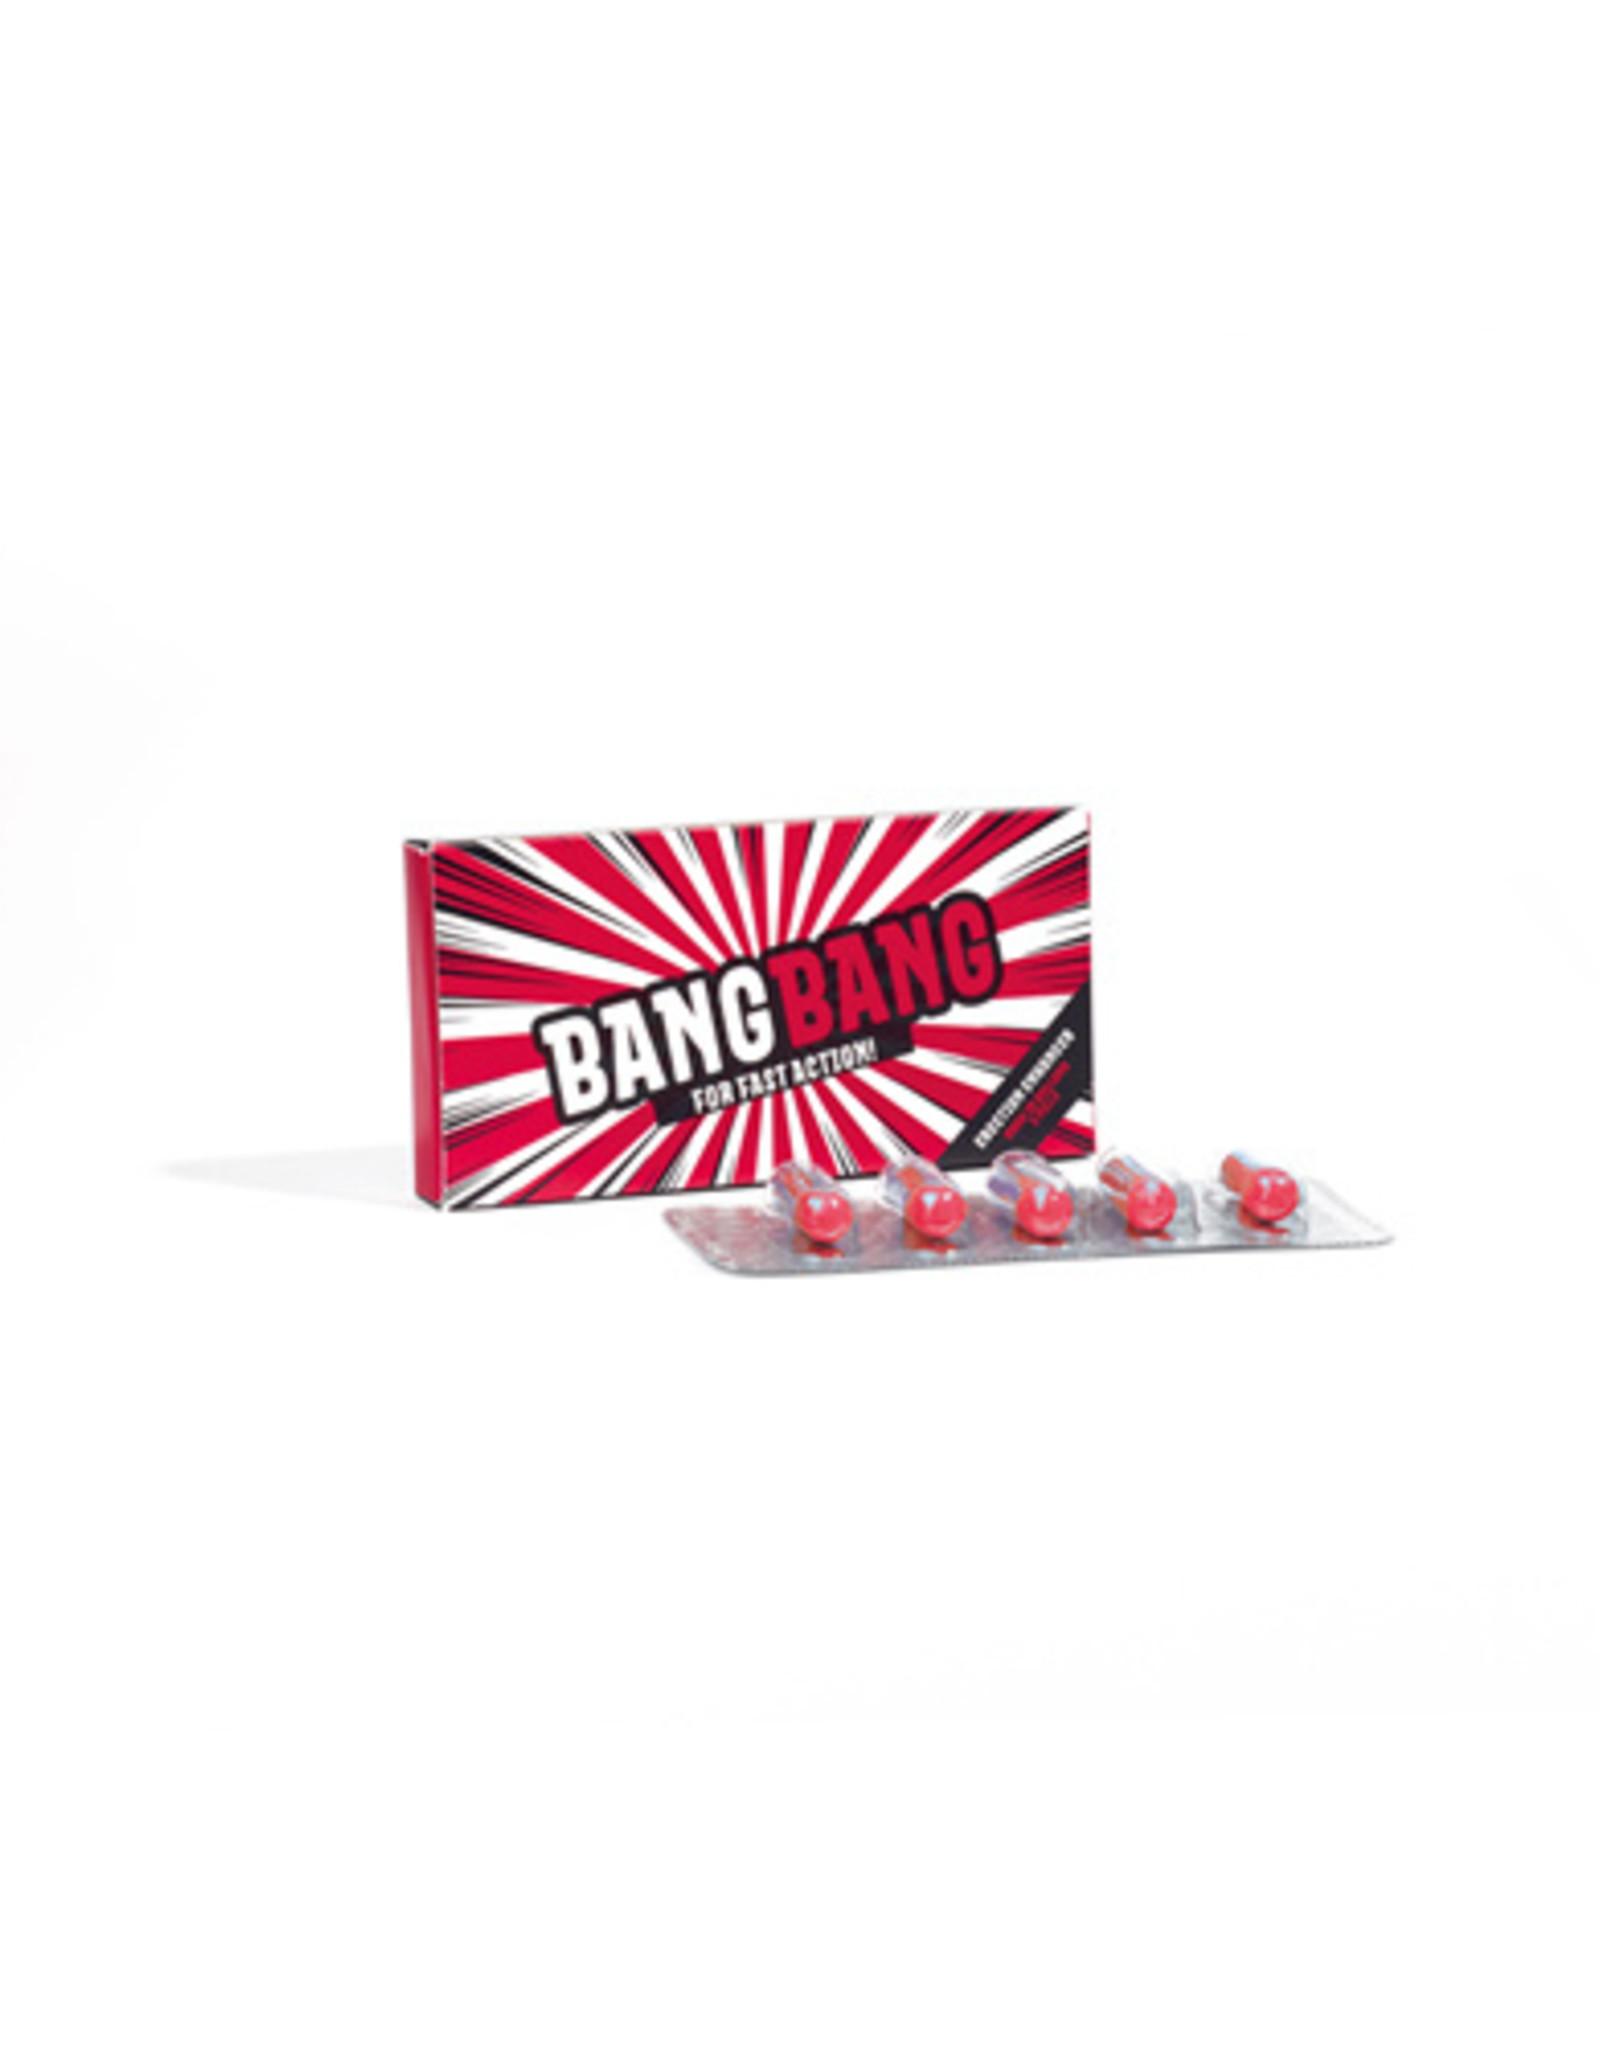 VitaVero Bang Bang! Erectiepillen - 5 Stuks